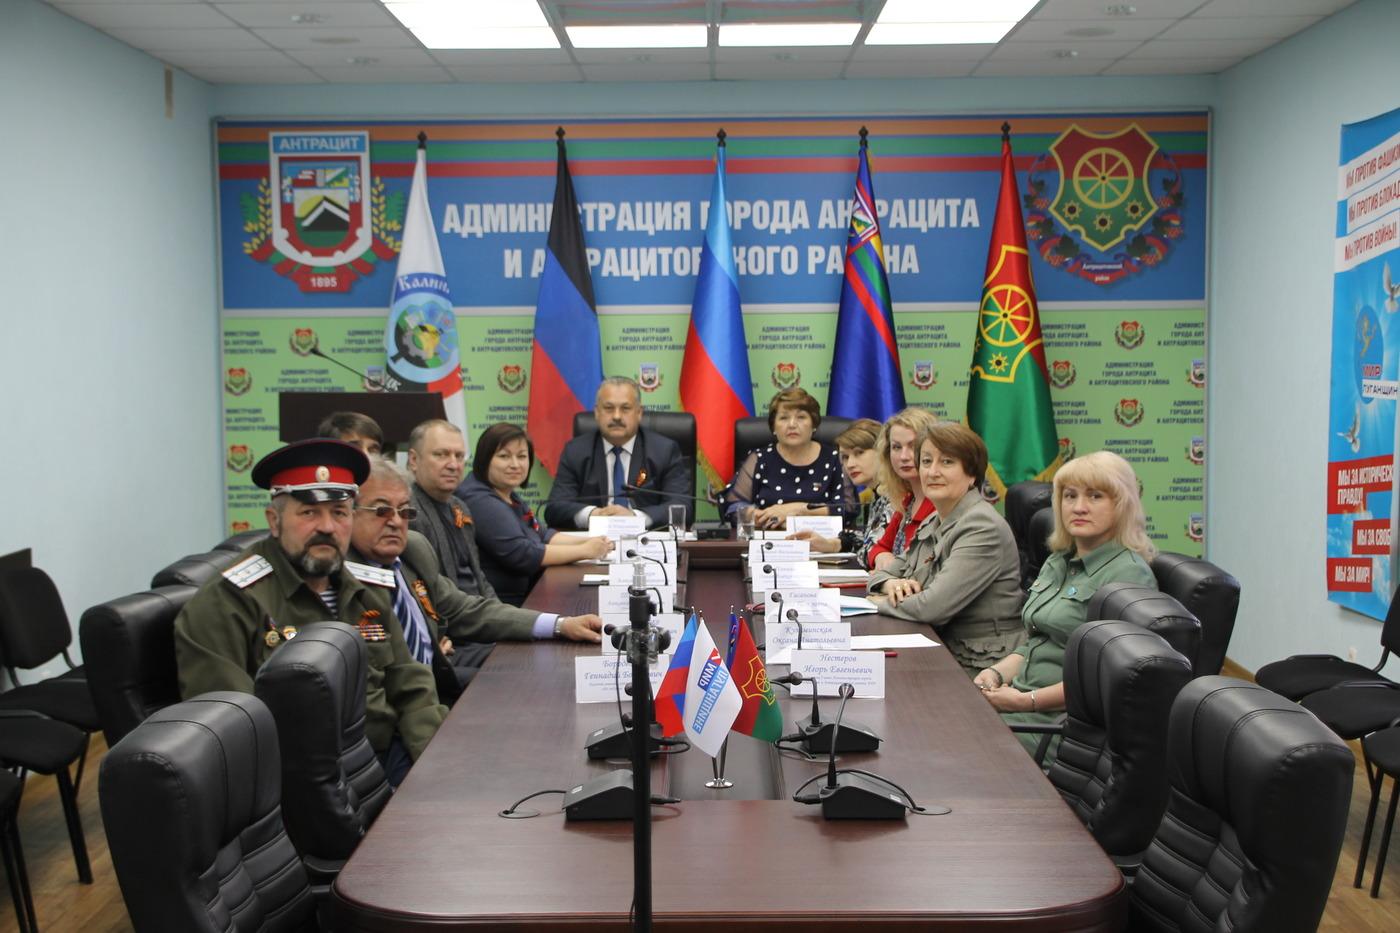 Активисты Антрацита приняли участие в онлайн конференции с жителями ДНР